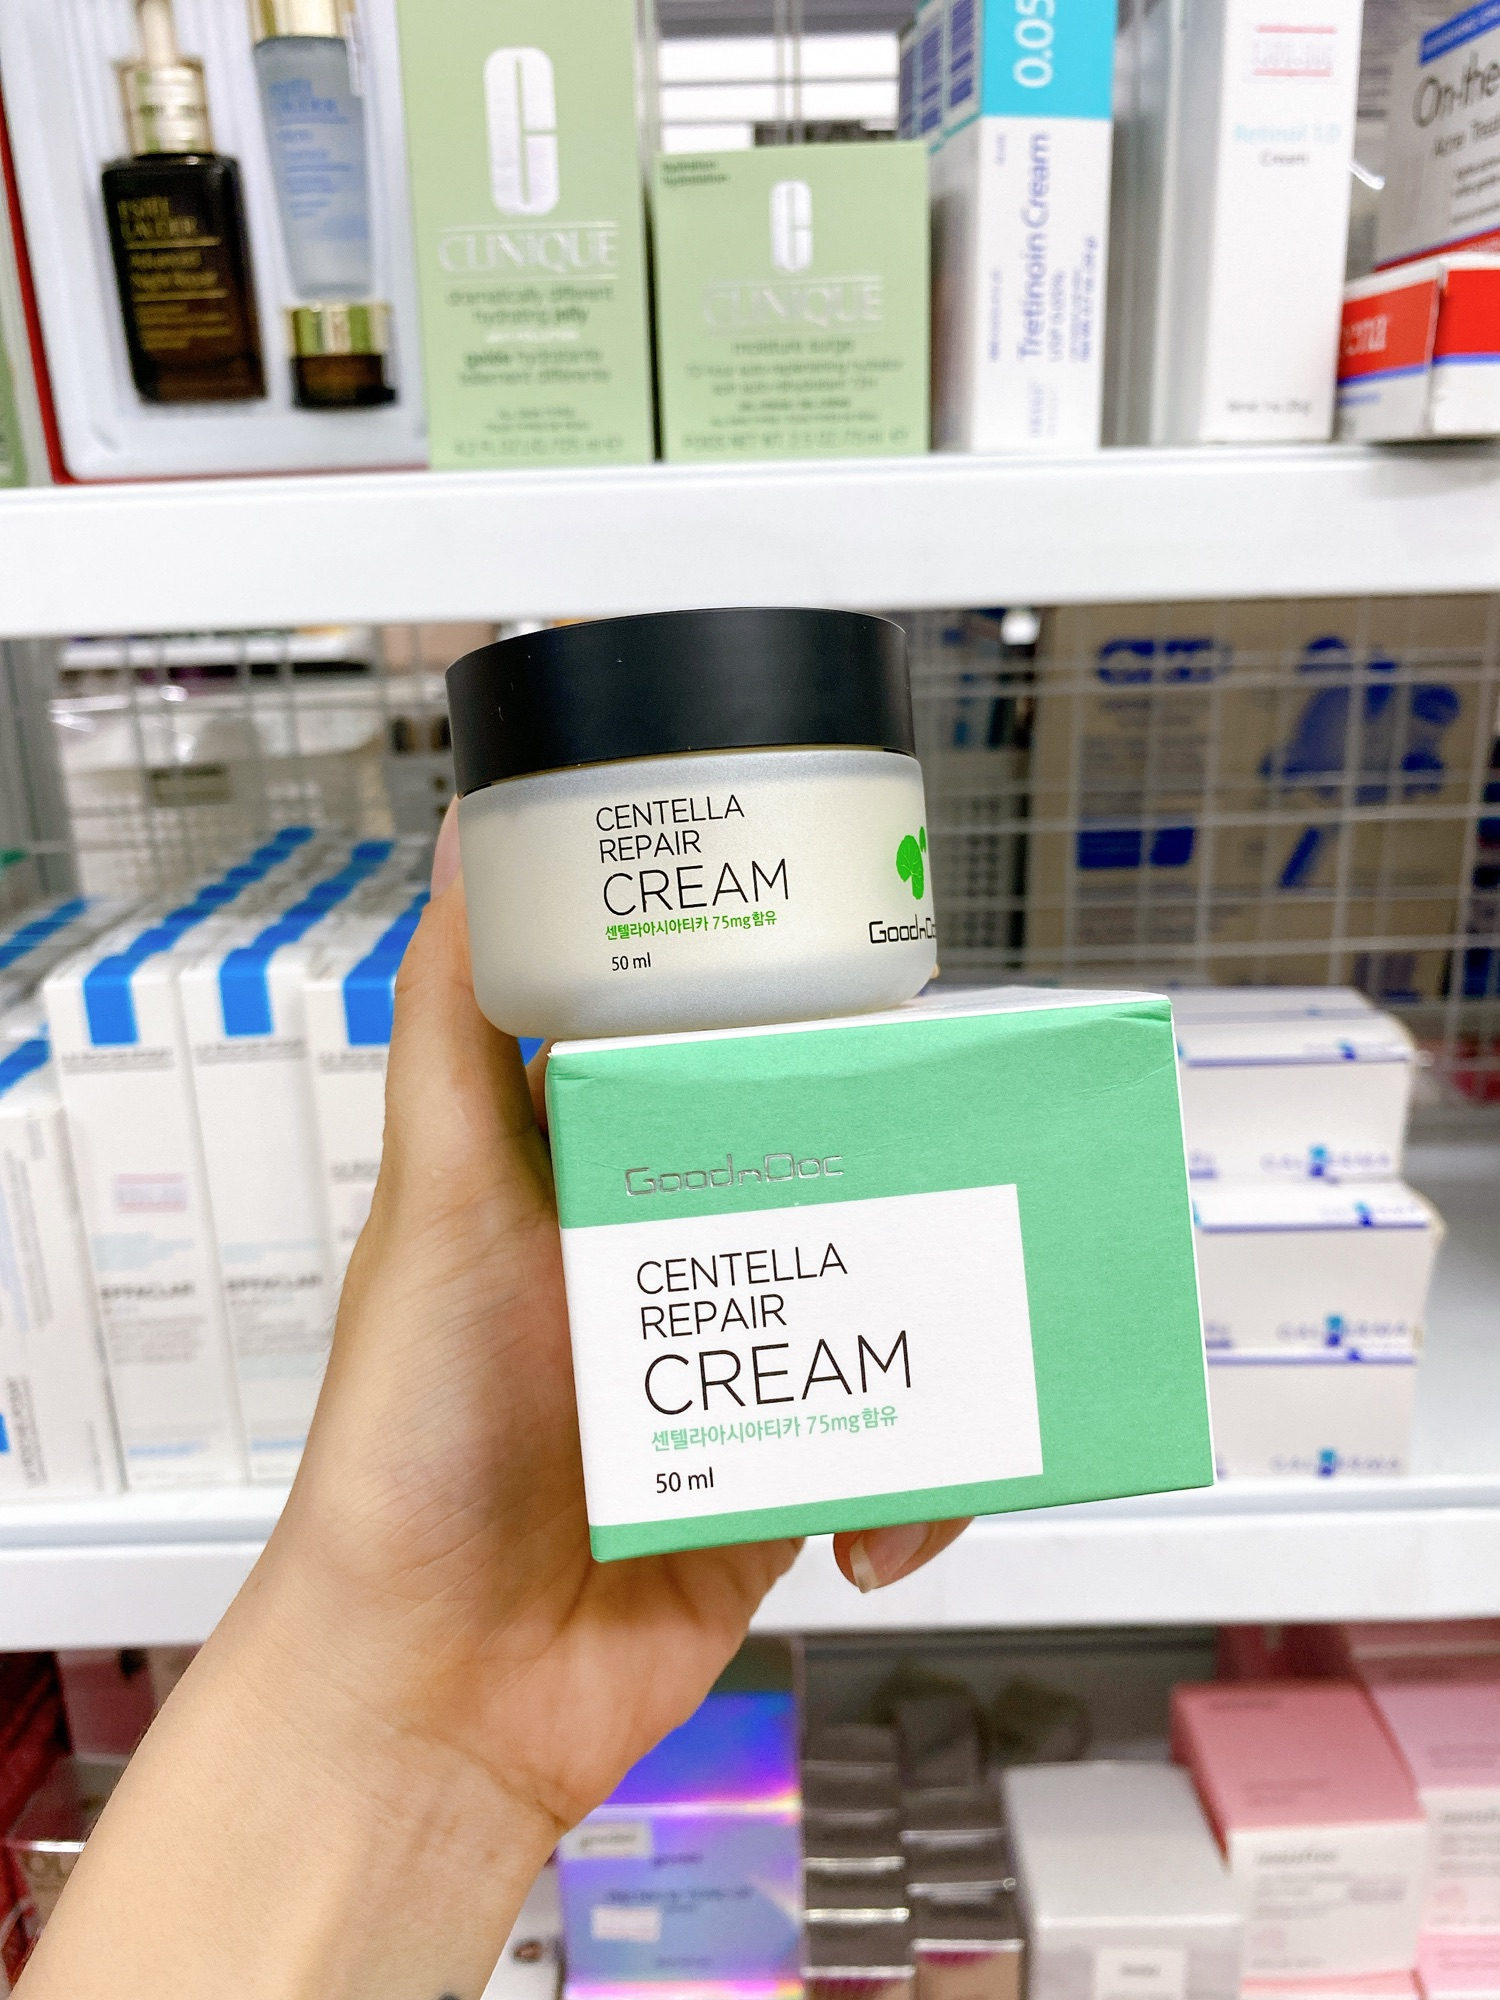 Kem GoodnDoc Centella Repair Cream bảo vệ da mượt mà